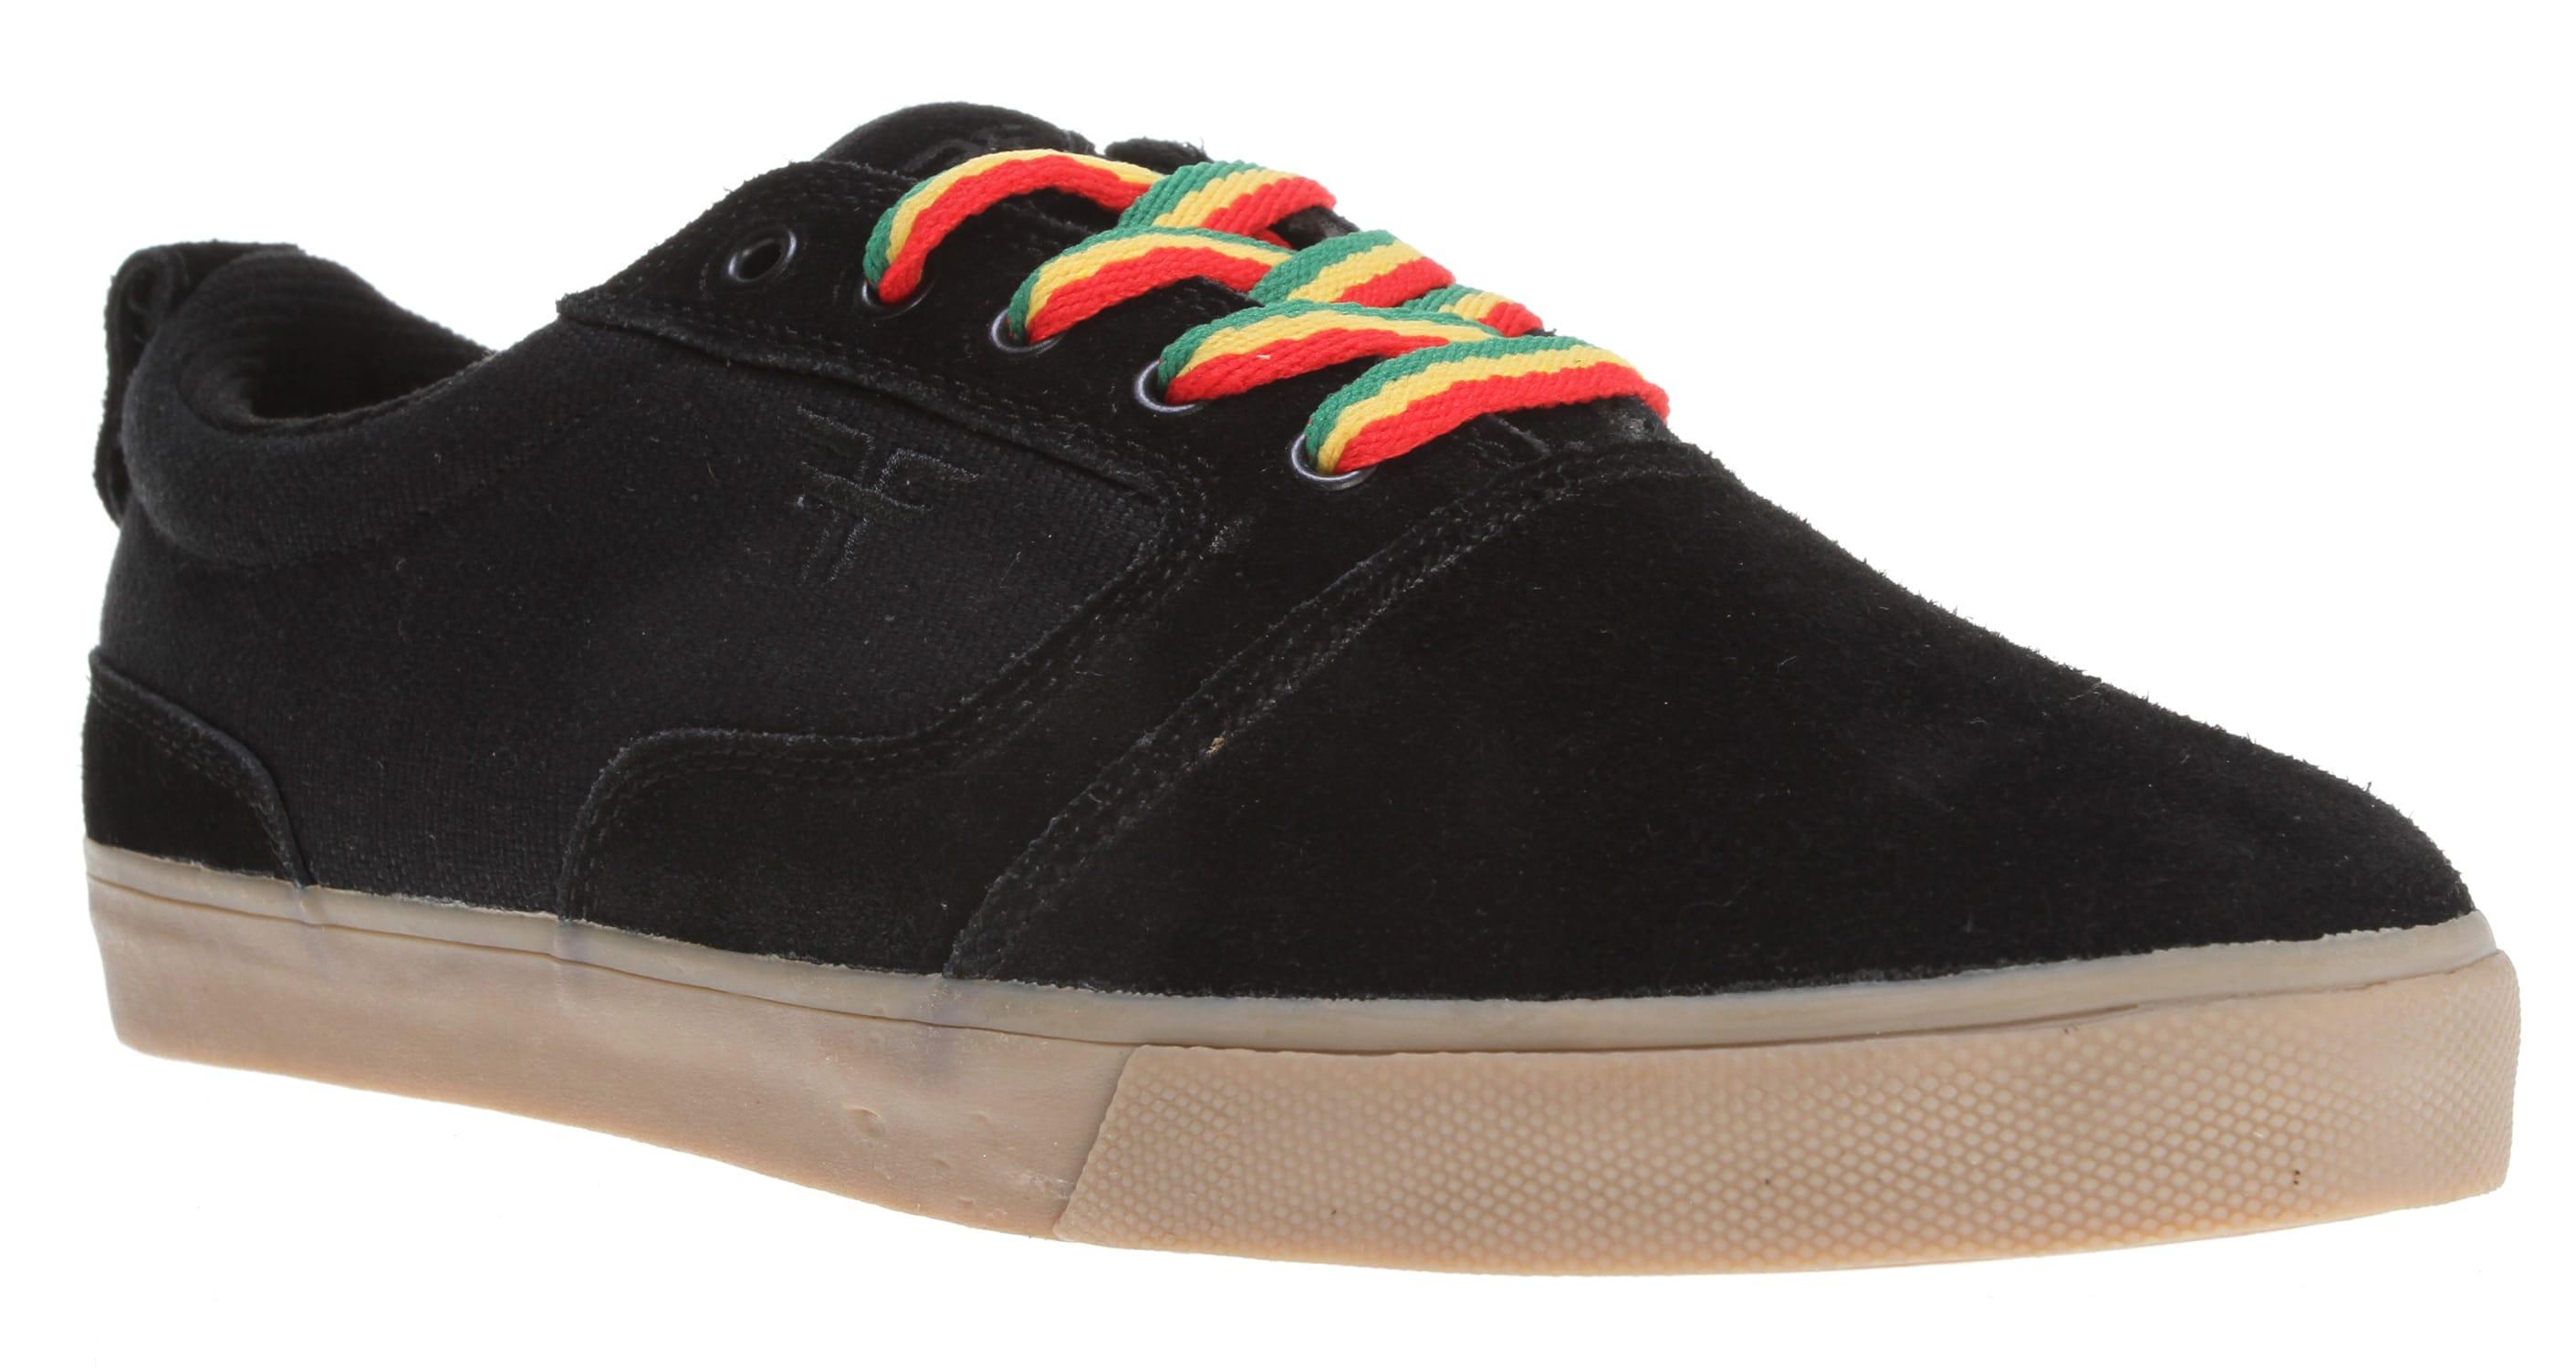 Skate shoes kingston - Fallen Kingston Skate Shoes Thumbnail 2